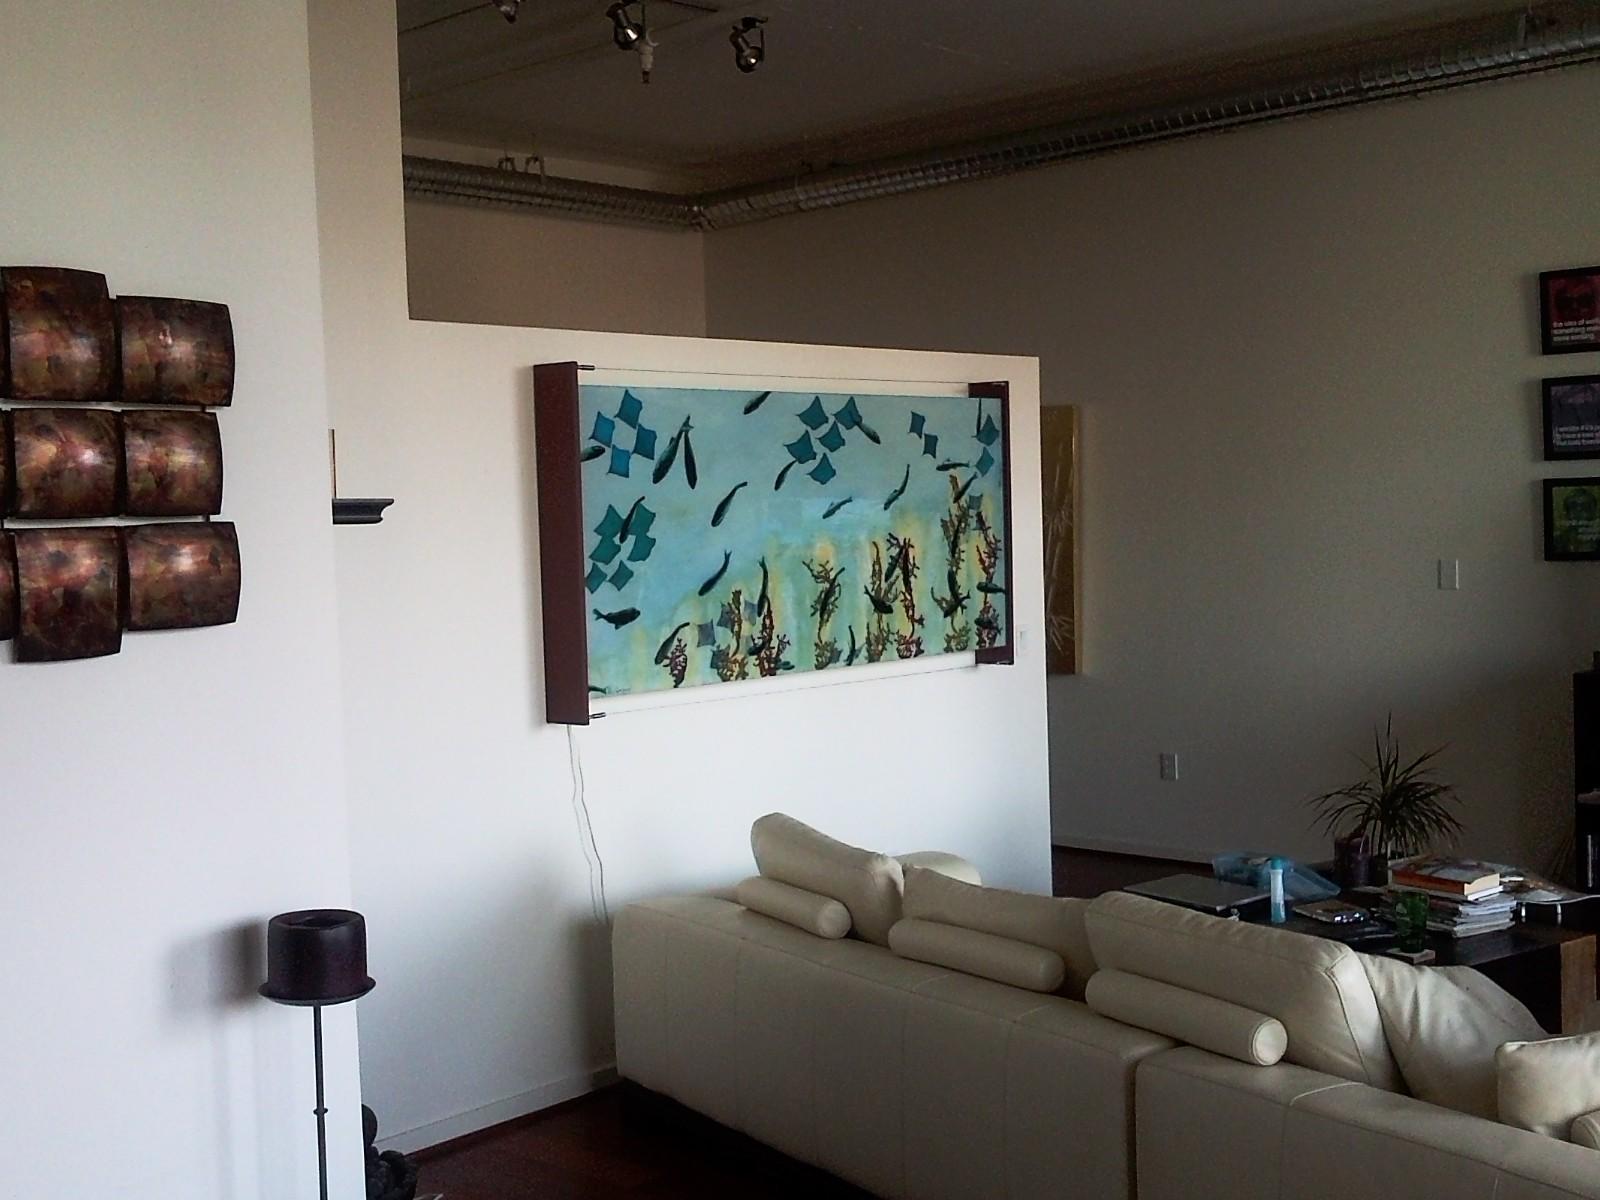 "Aquarium #2, 2011 Mixed Media on Glass 28 x 76"" $4500"